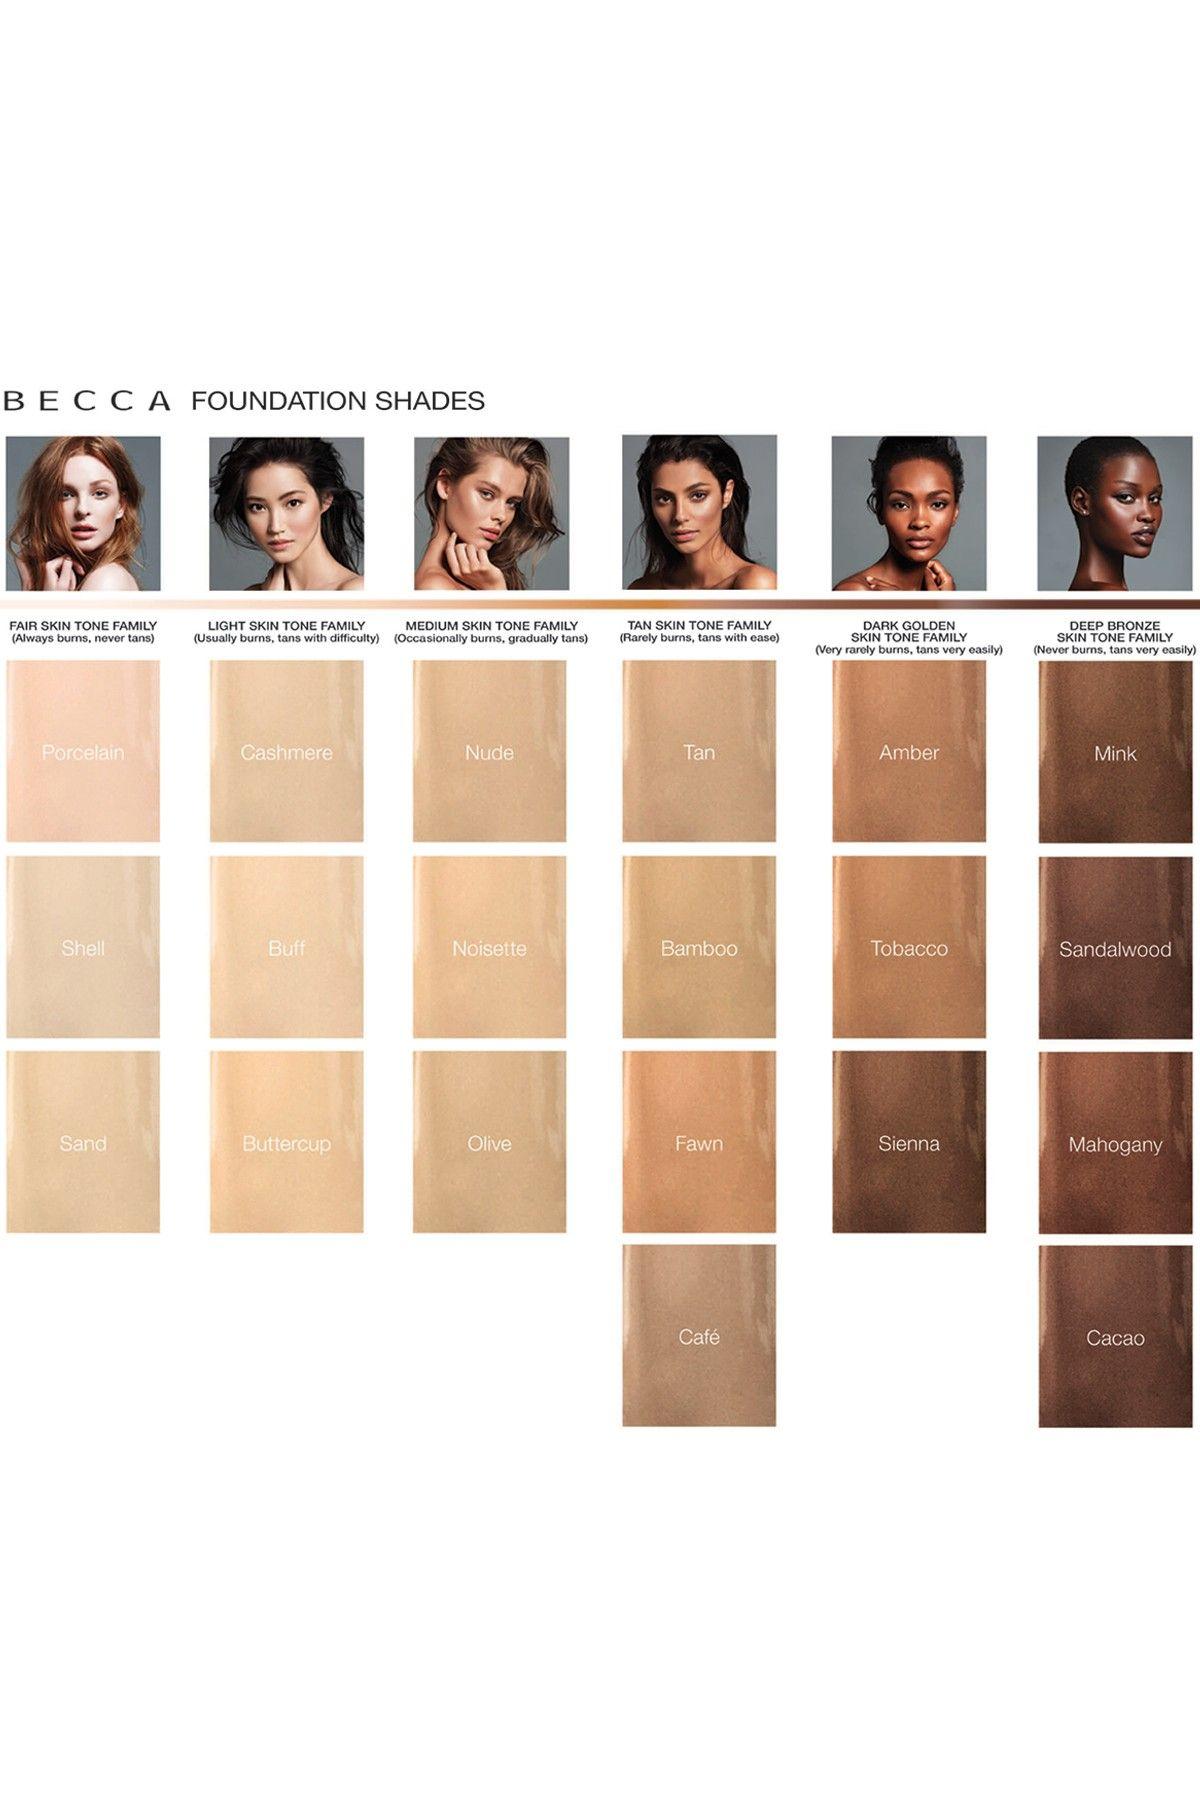 BECCA Foundation Color Chart | Makeup looks | Pinterest | Charts ...